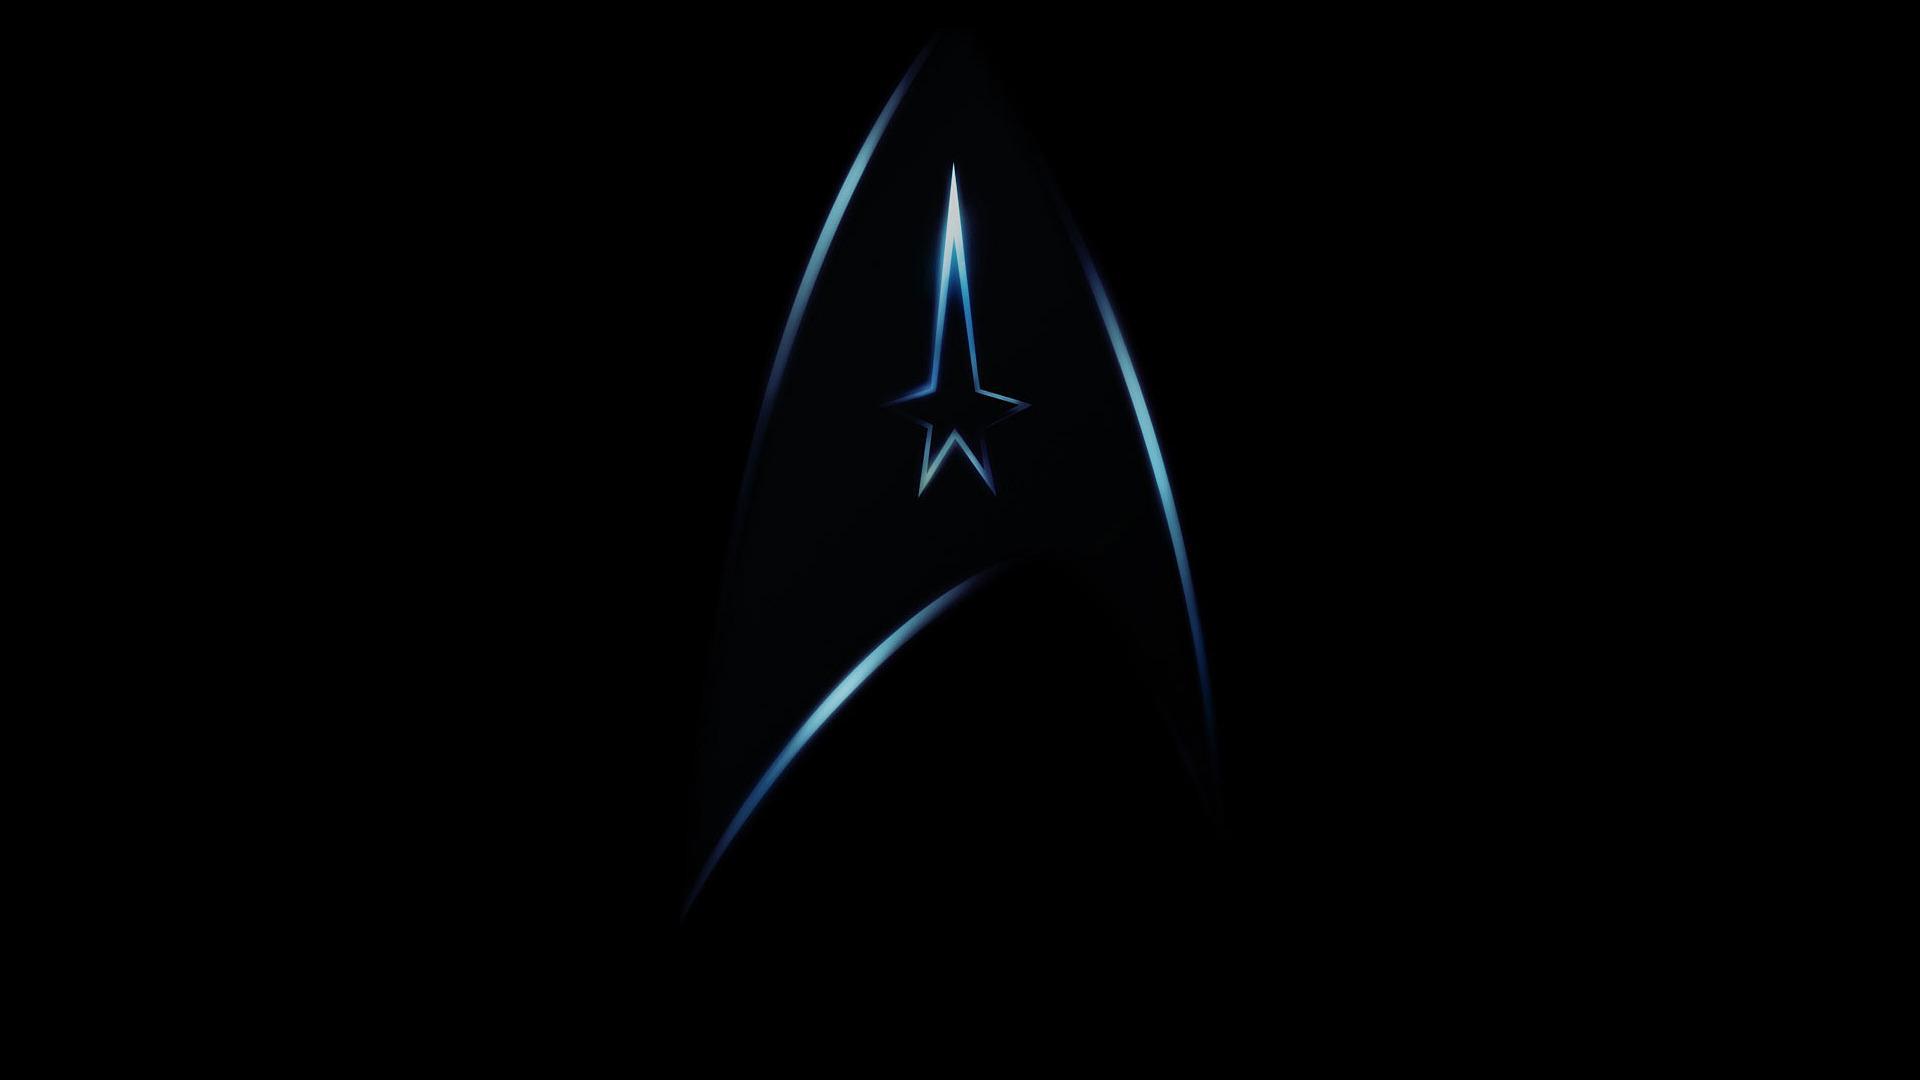 Star-Trek-Logo-Wallpapers-www.wallpapersbrowse.com.jpg